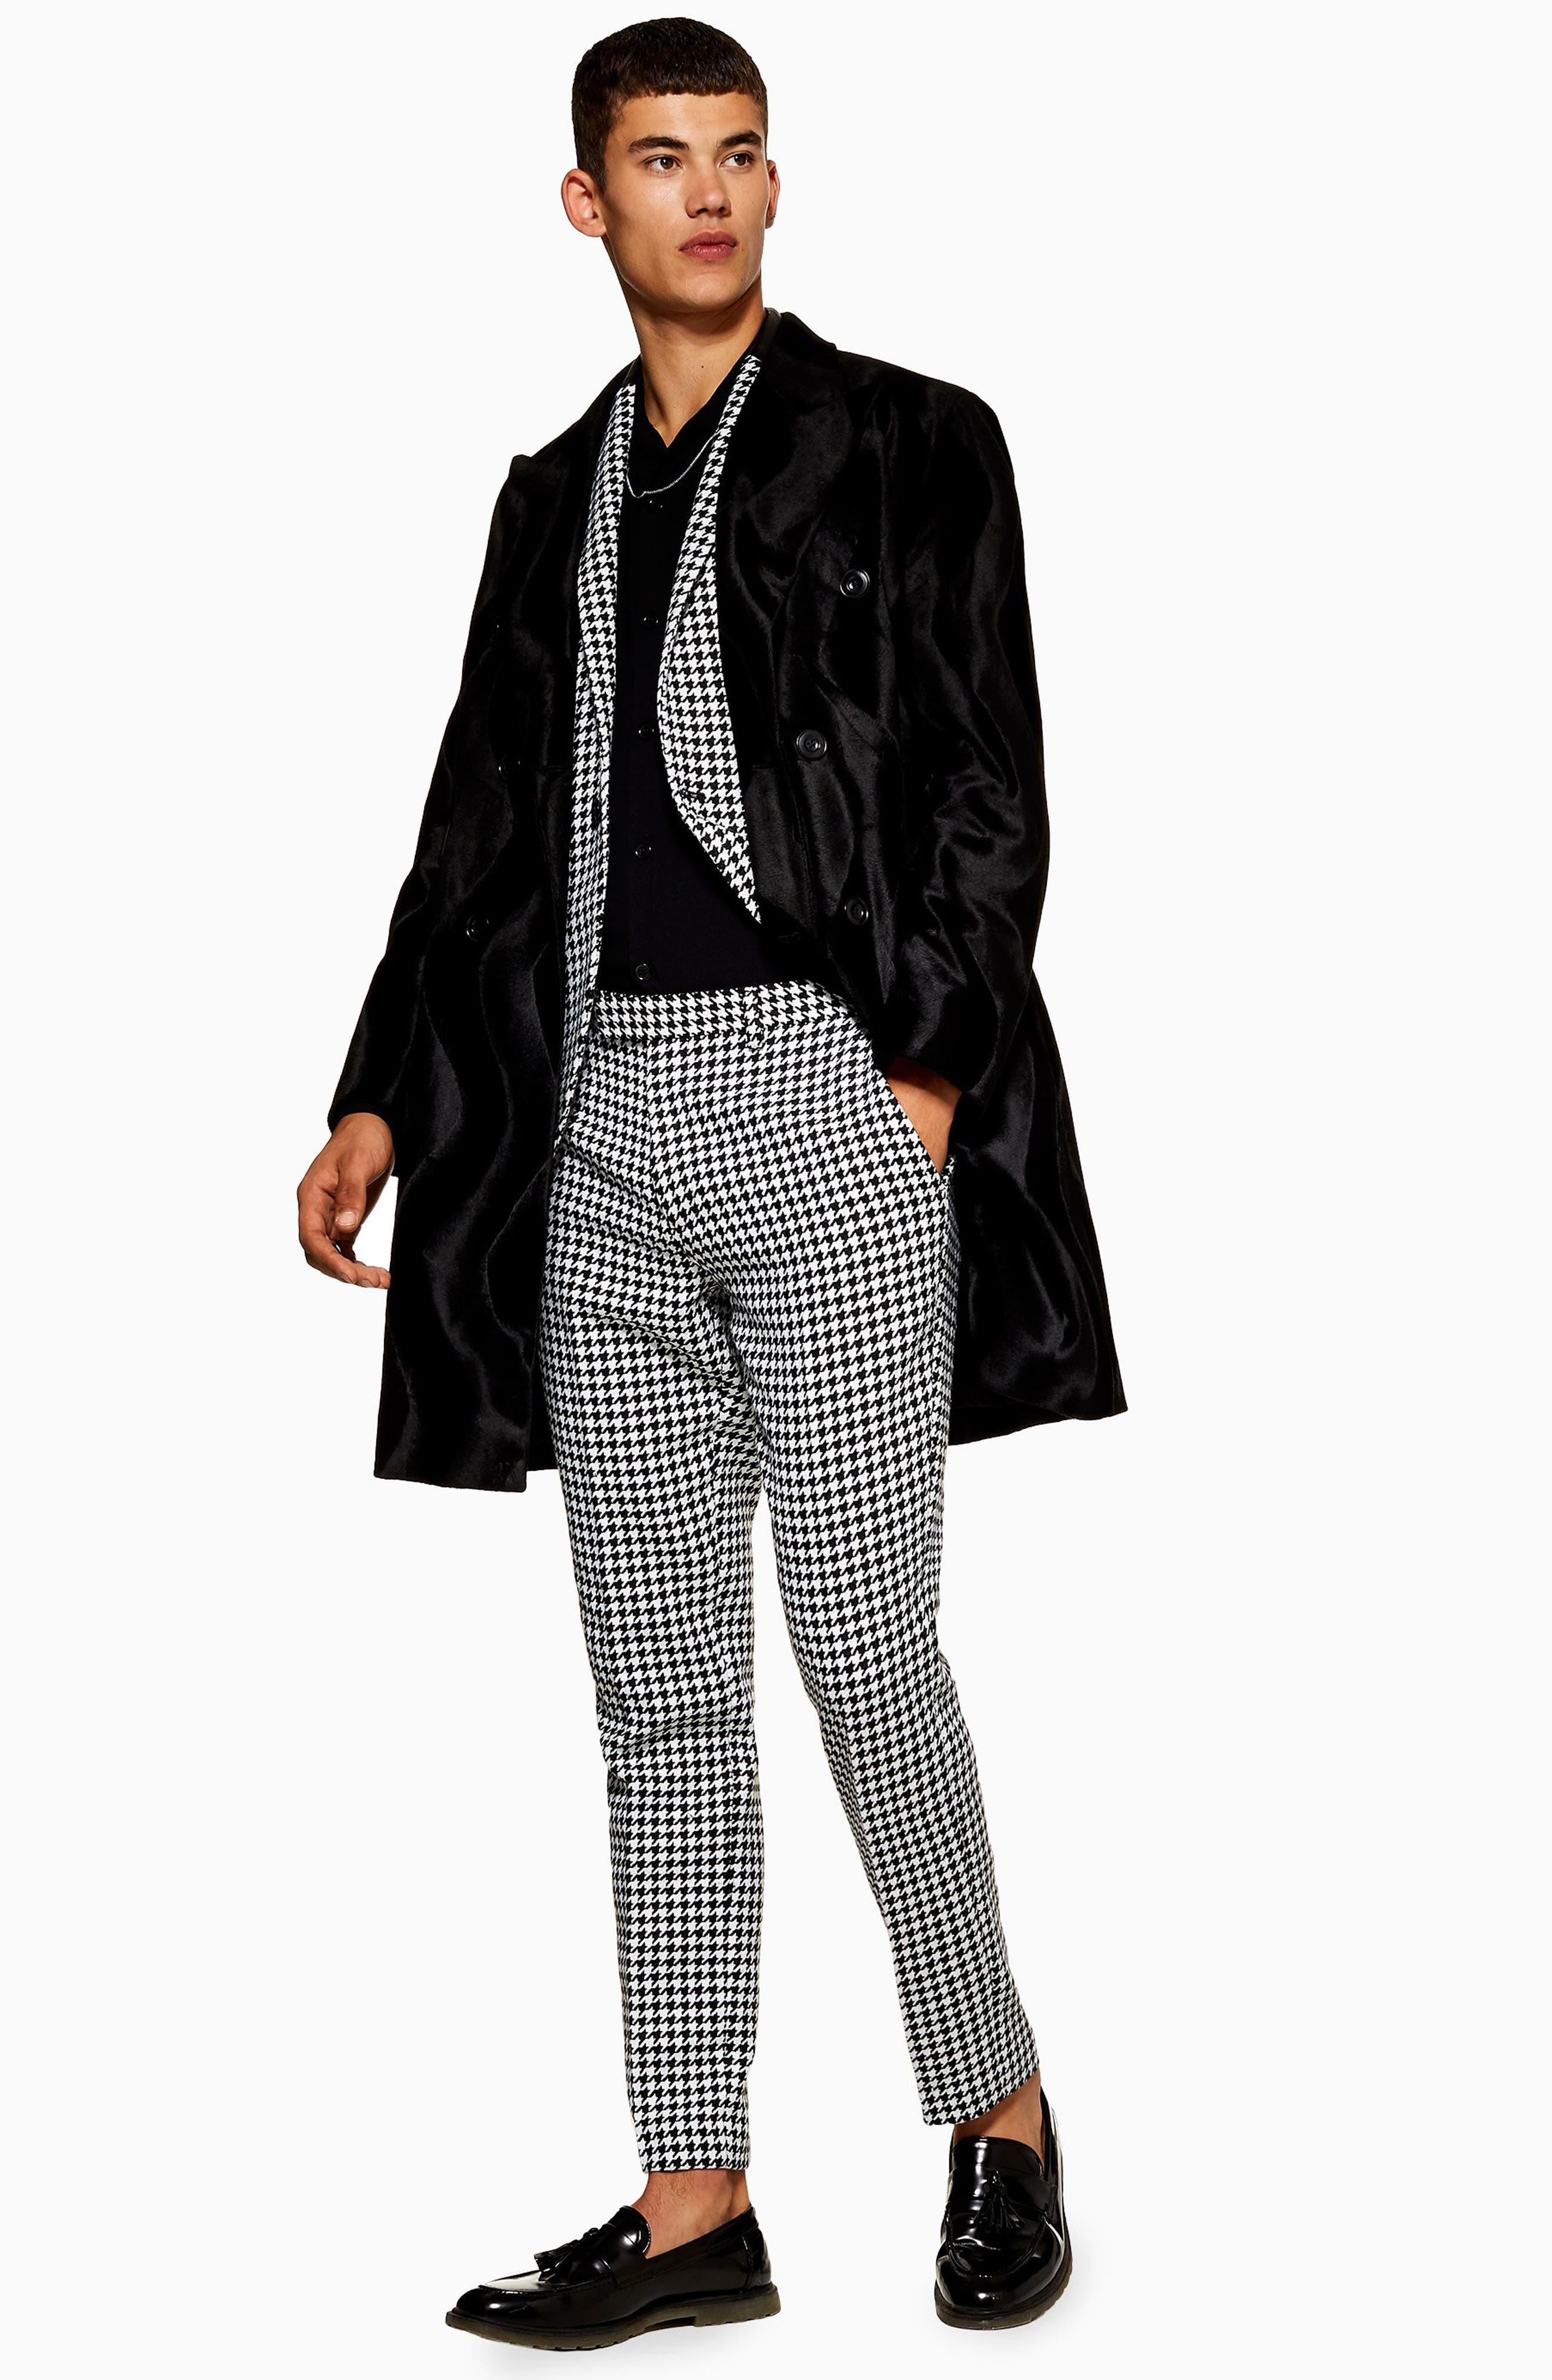 TOPMAN, Roe Skinny Fit Trousers, Alternate thumbnail 5, color, 001